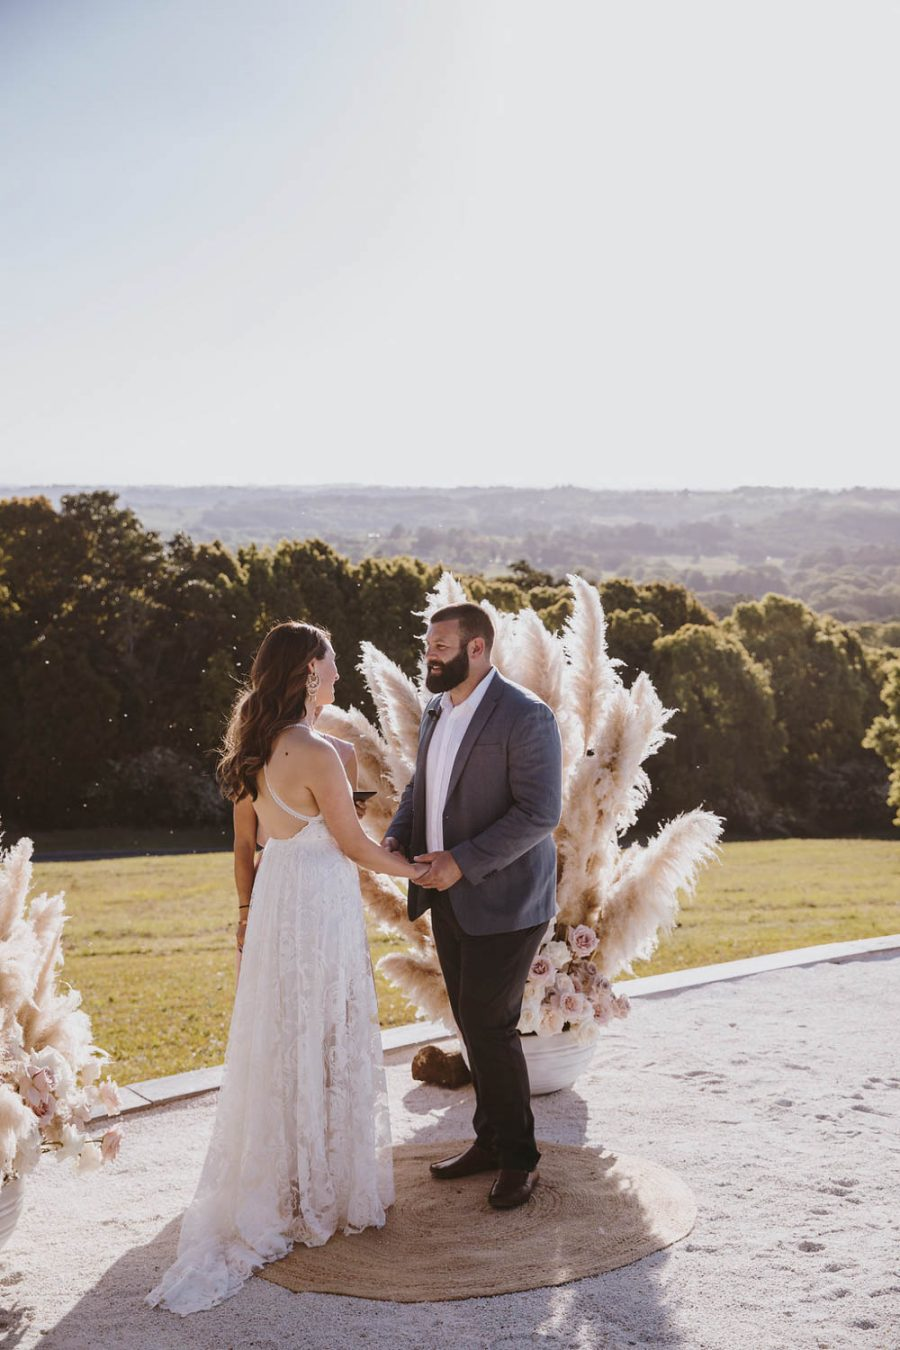 Bride and groom / wedding photography / Temple Farmhouse / Micro Wedding